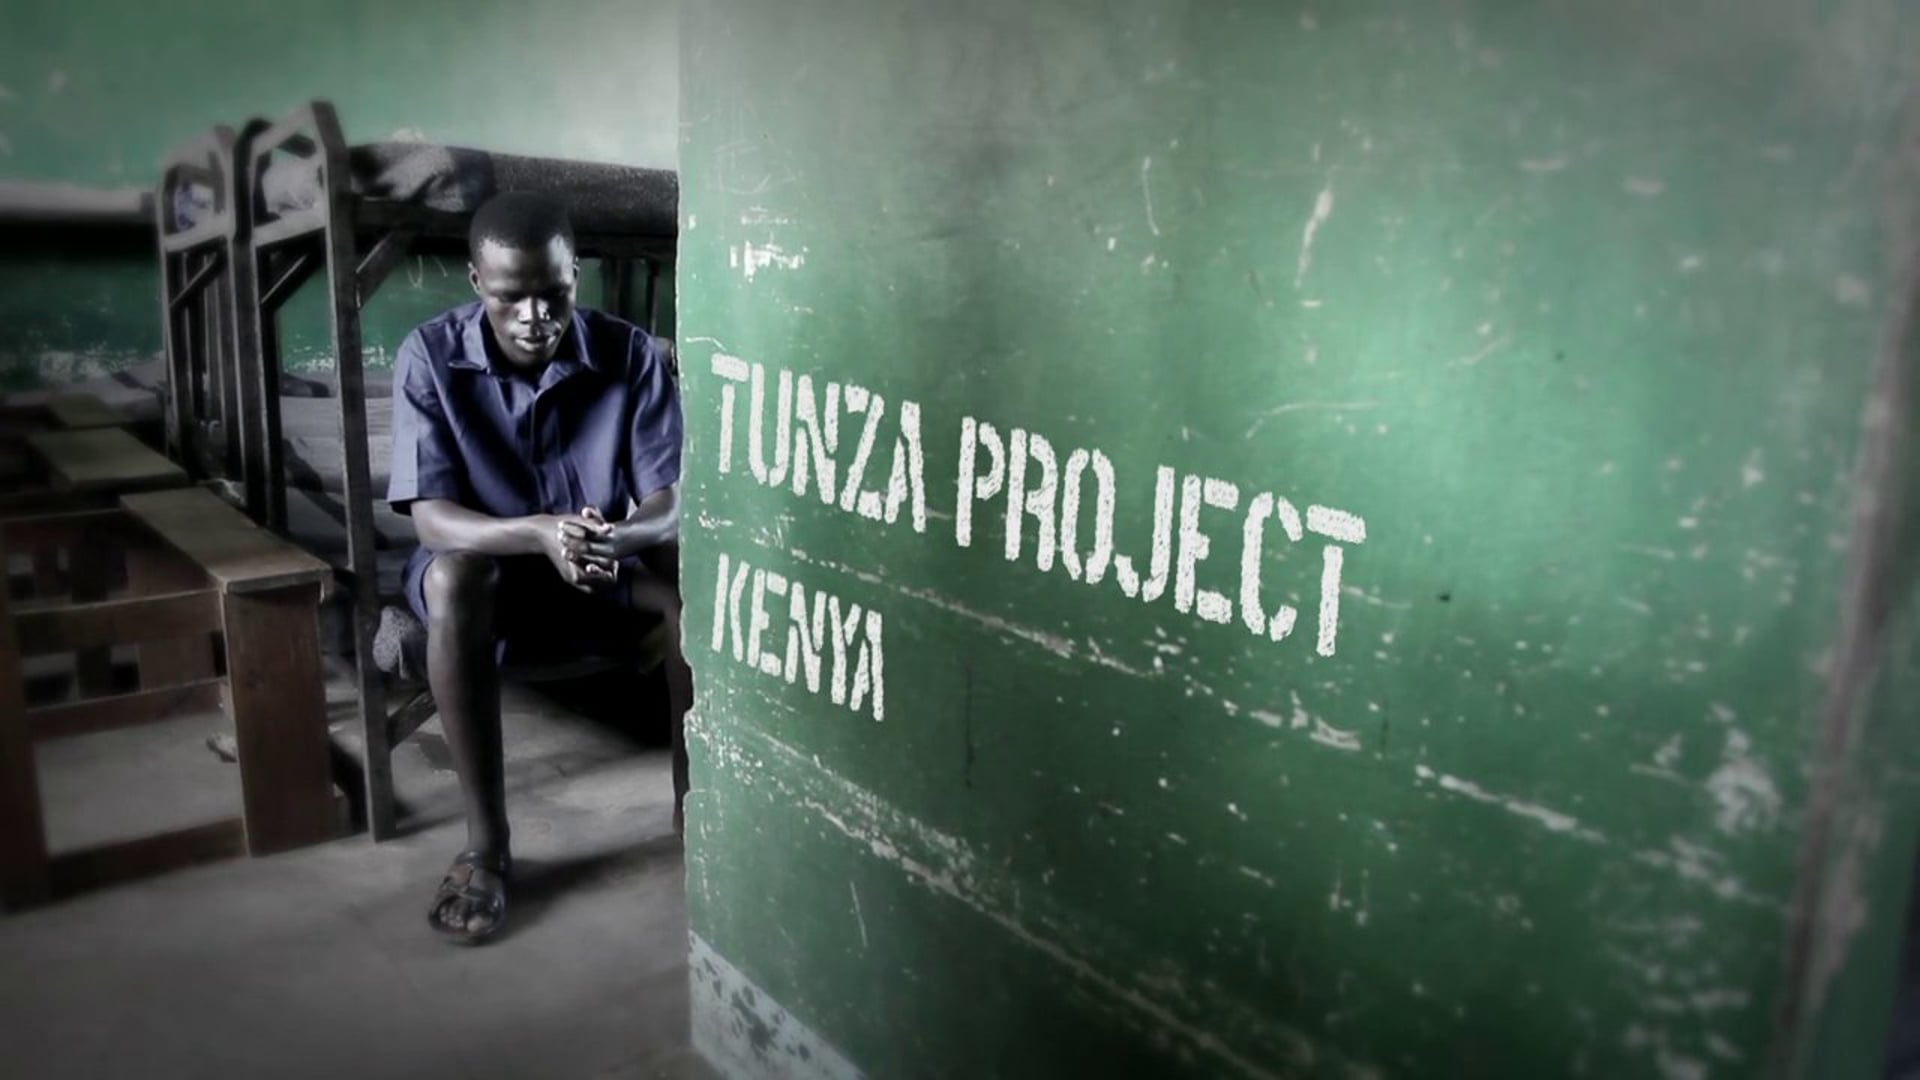 Tearfund - The Tunza Project, Kenya